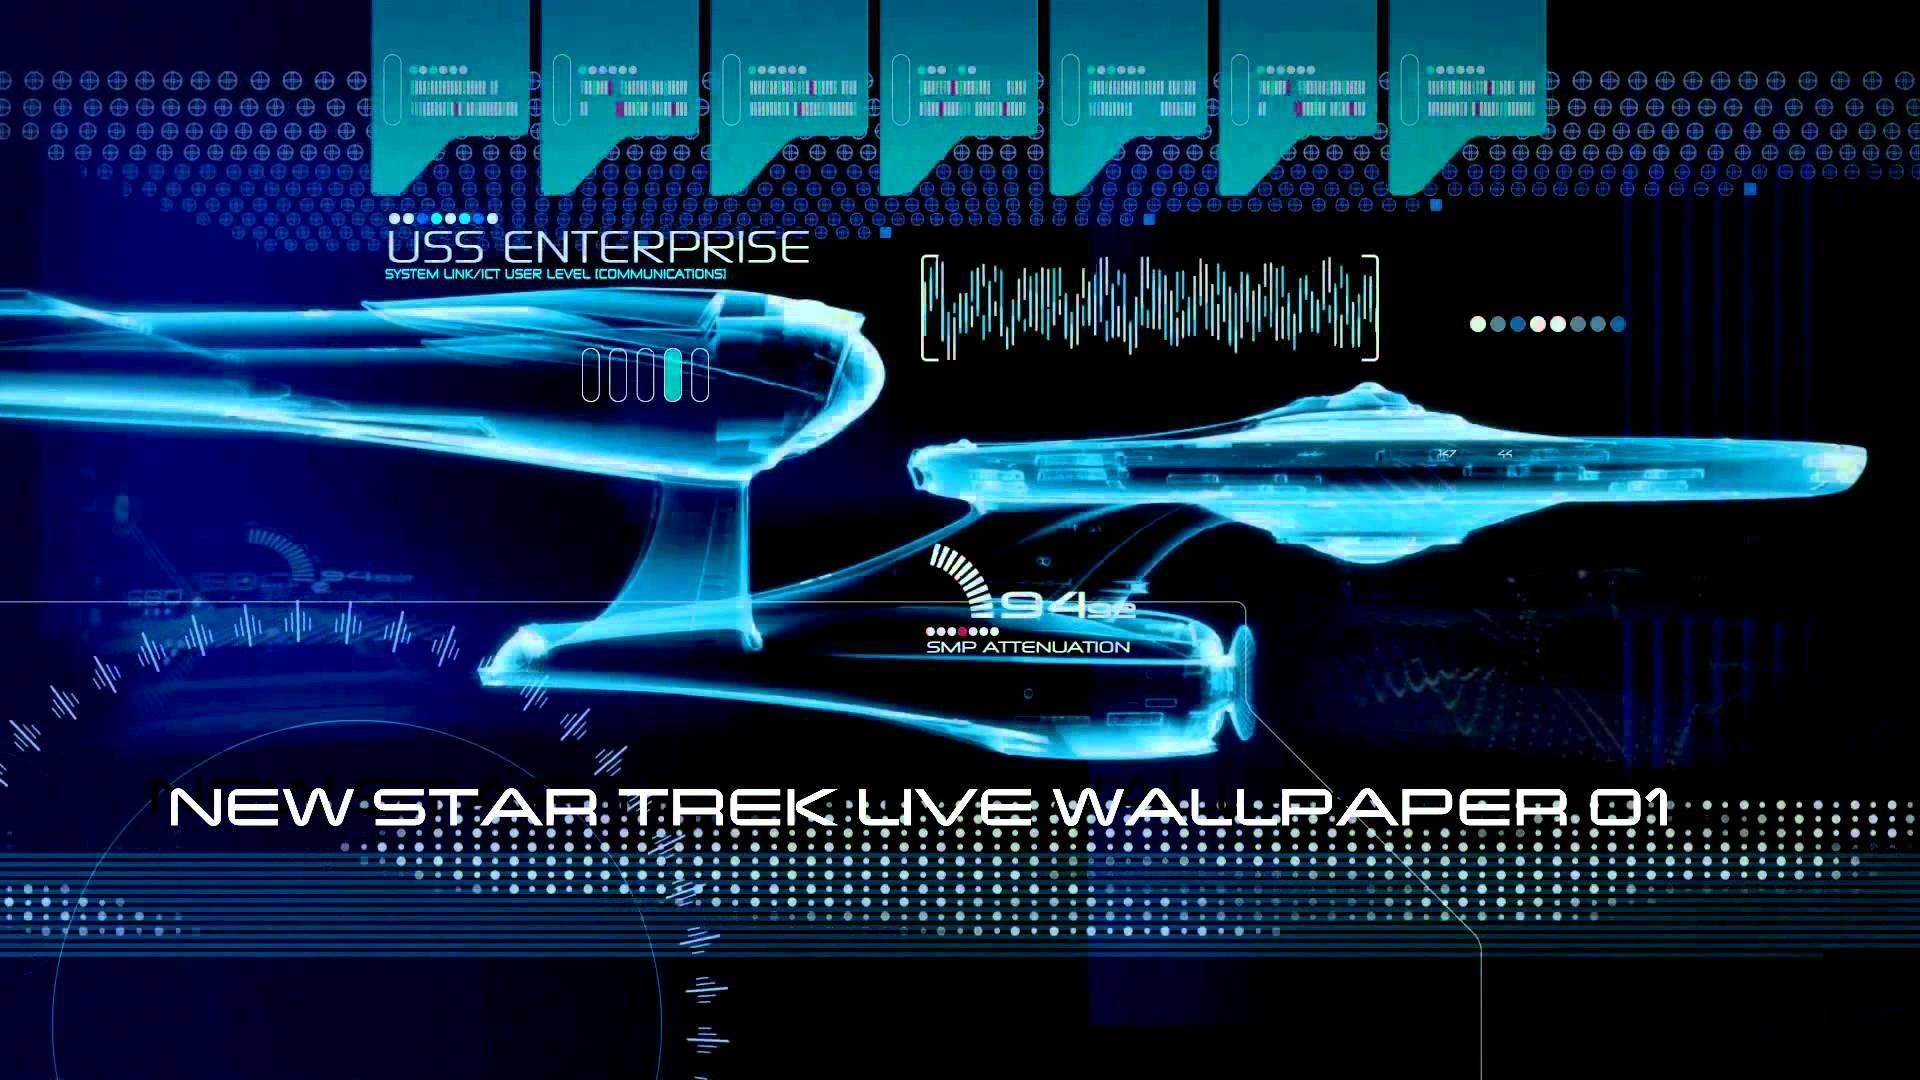 New Star Trek Live Wallpaper - Star Trek Discovery Lcars , HD Wallpaper & Backgrounds